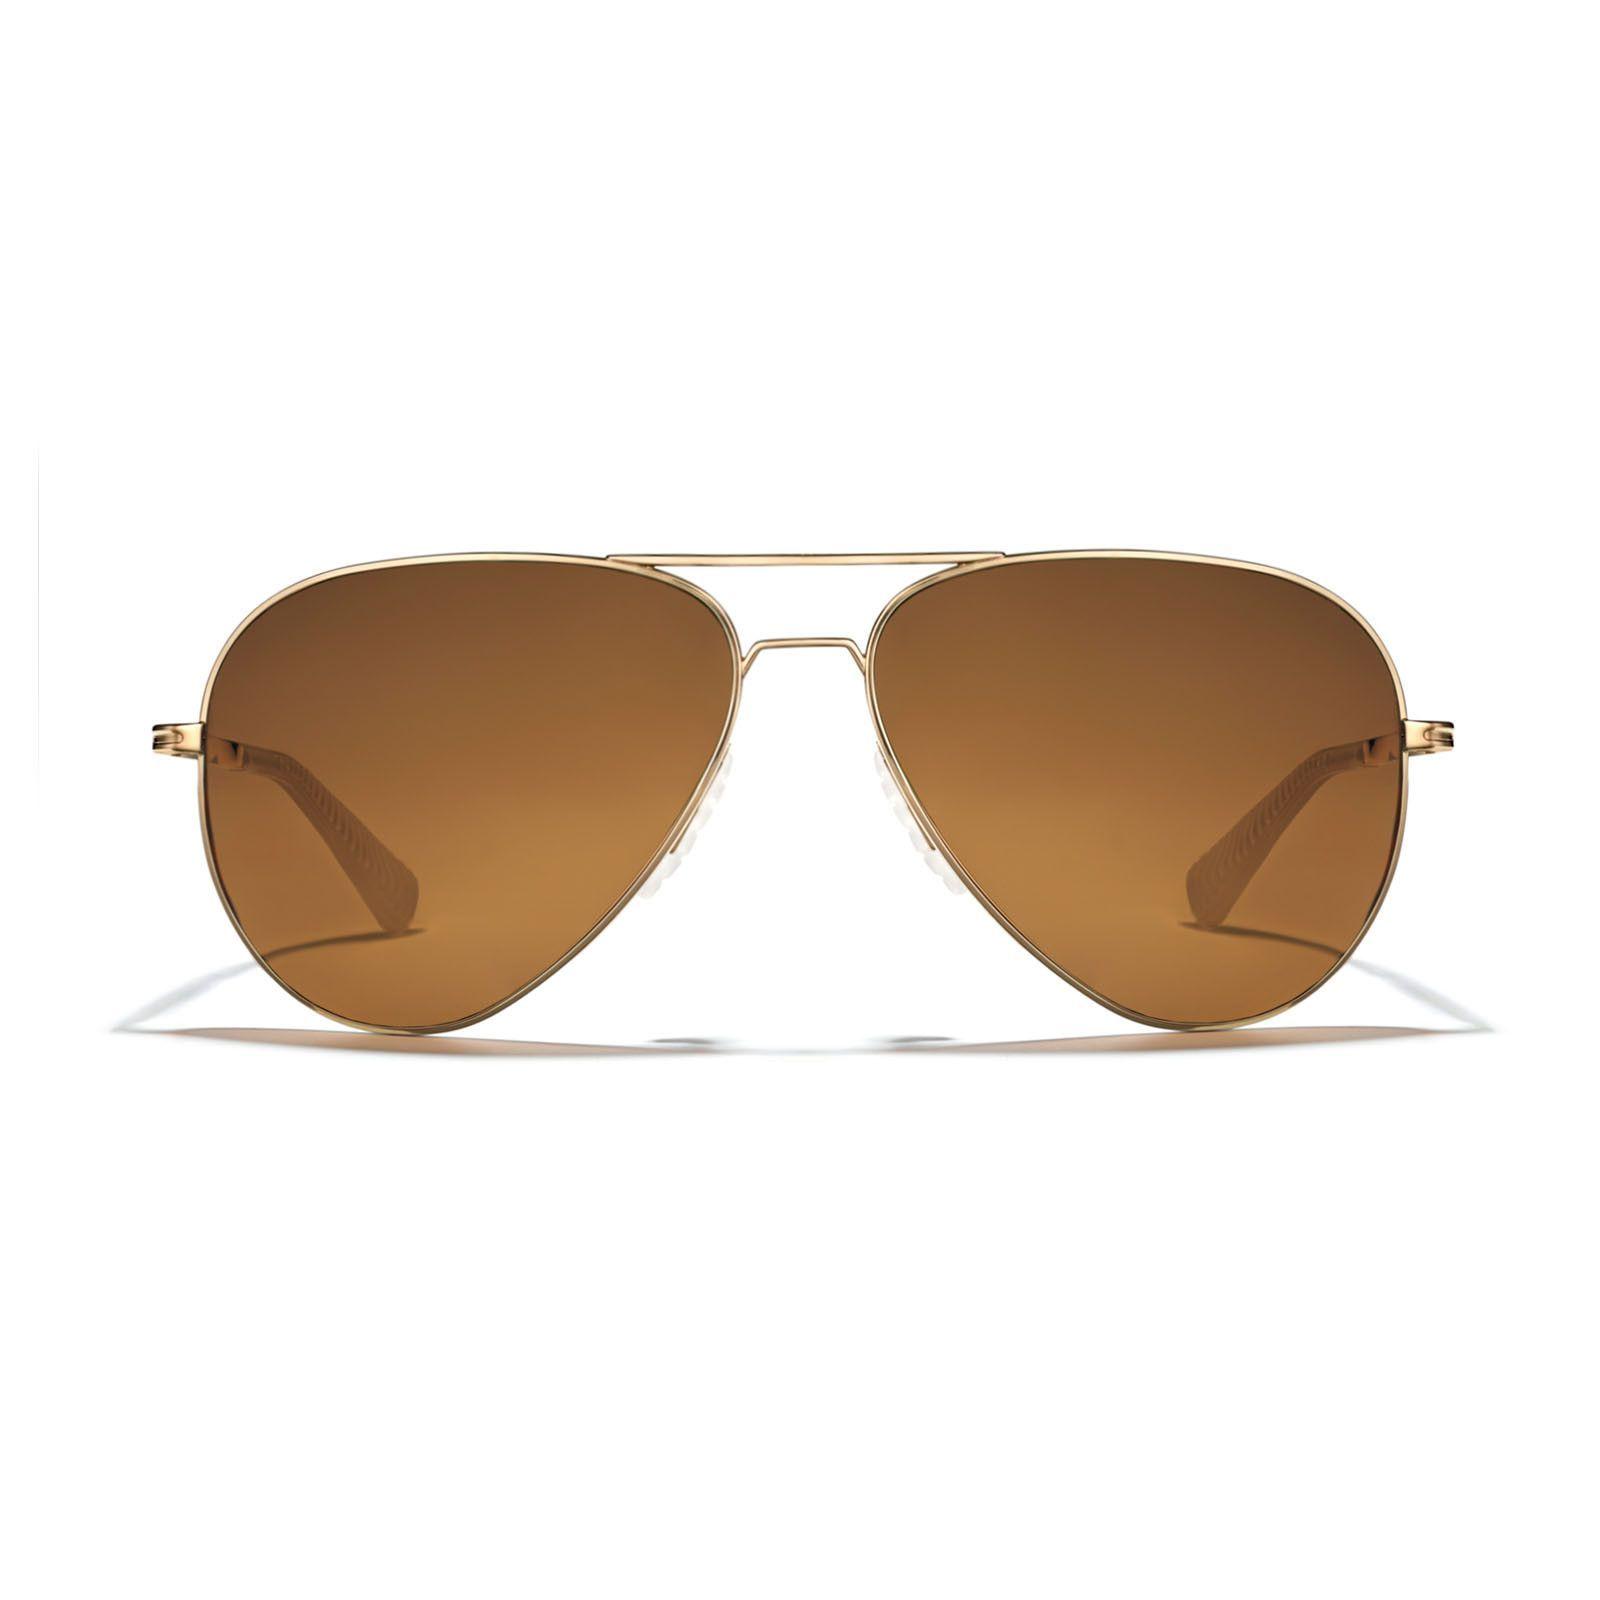 3175f18fbaac Phantom C3 Glass Gold Aviator Sunglasses, Sports Sunglasses, Mirrored  Sunglasses, Book Jewelry,